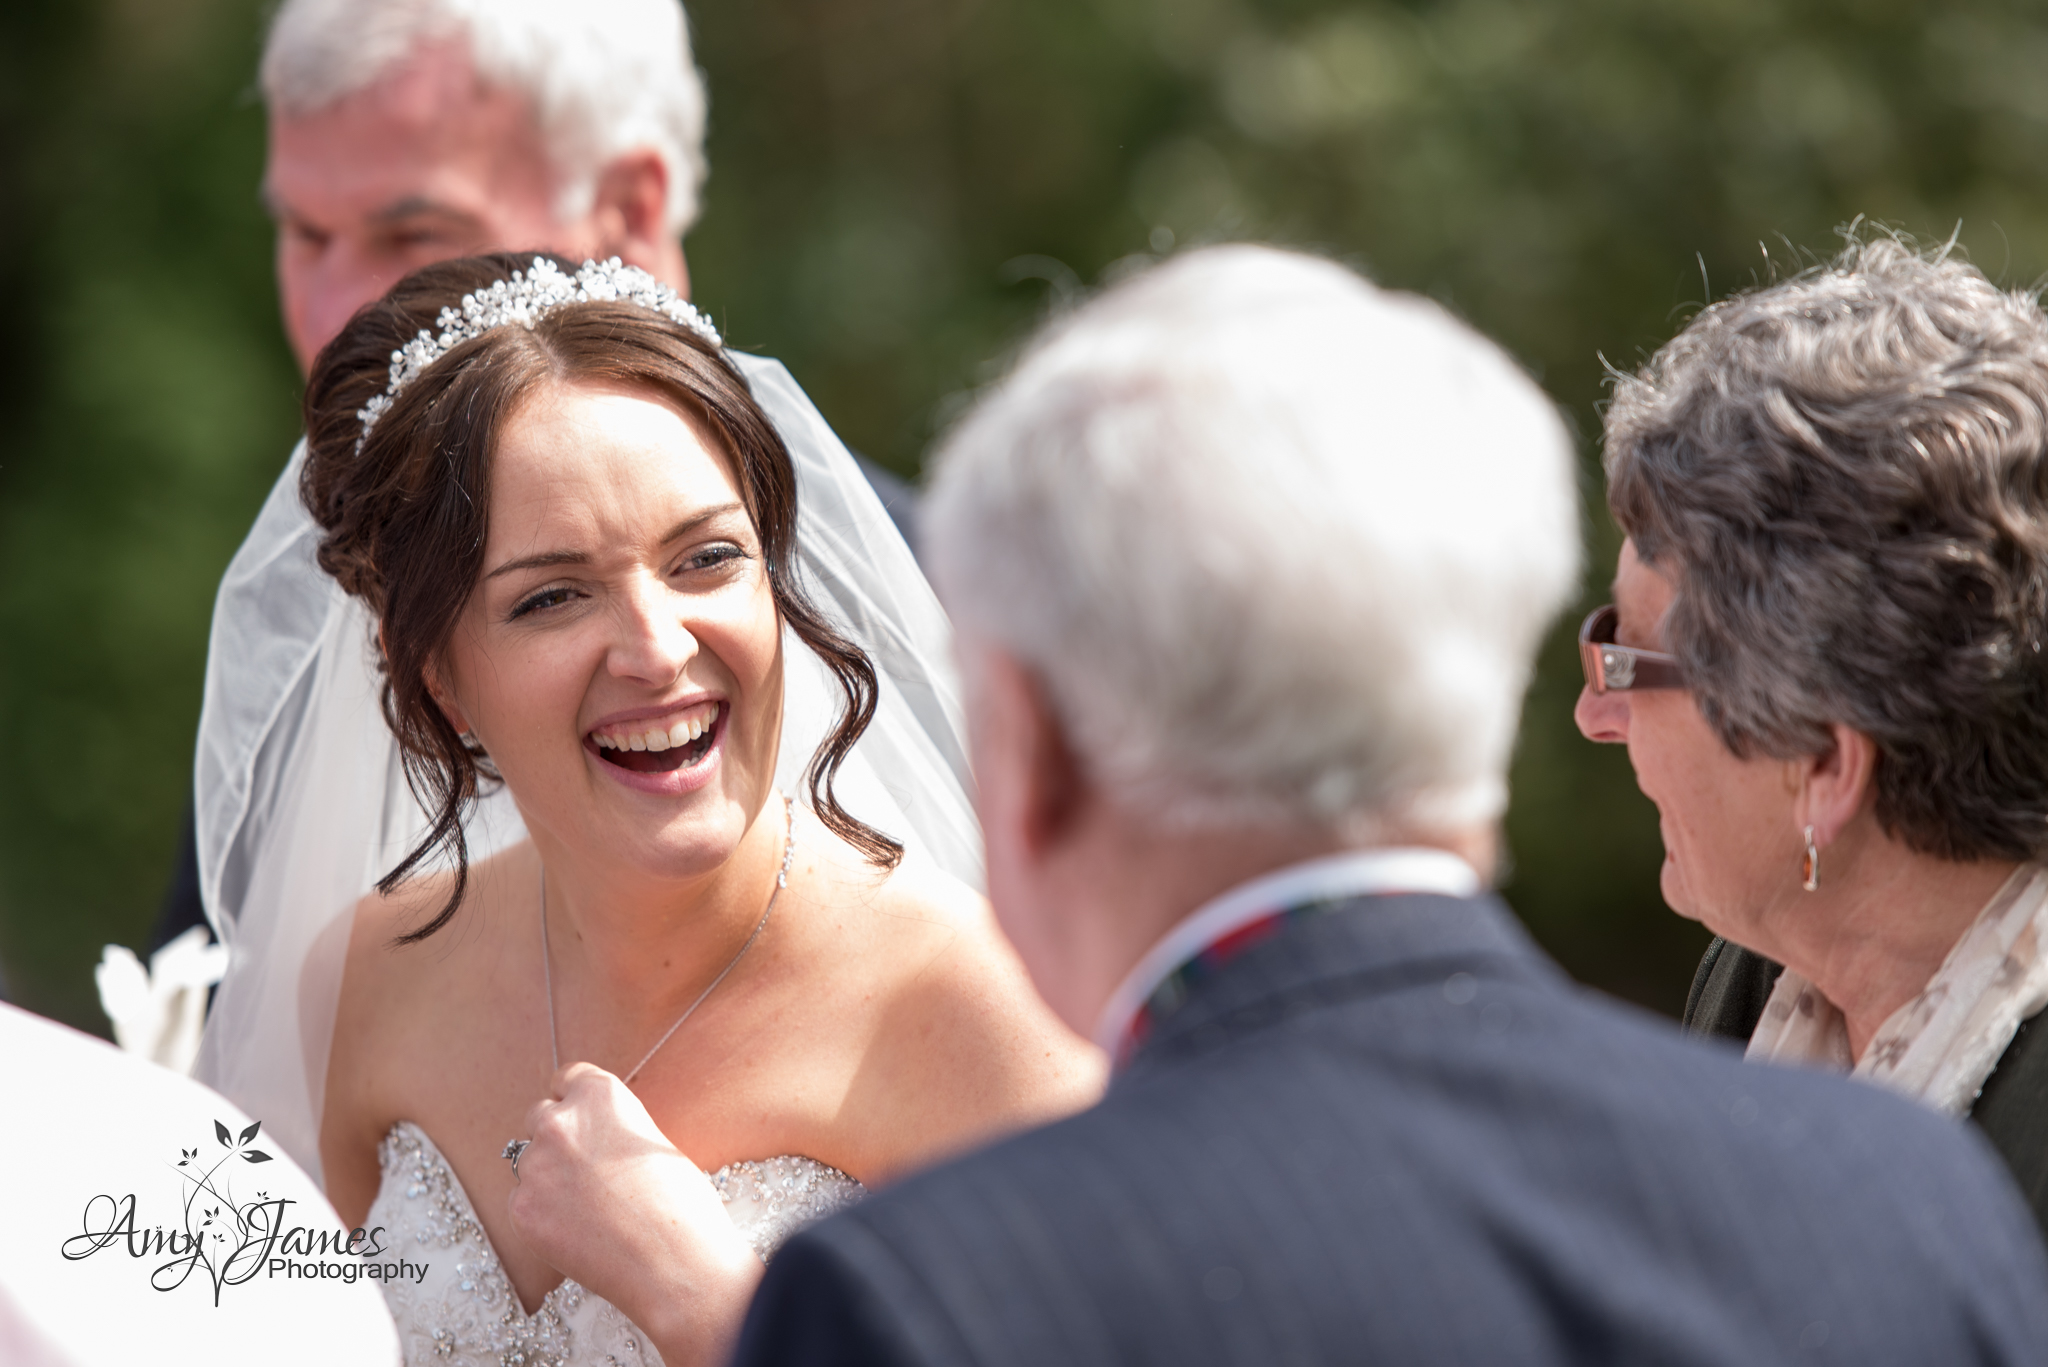 Hamphire wedding photographer // Fleet wedding photographer // Frimley Hall Hotel Wedding